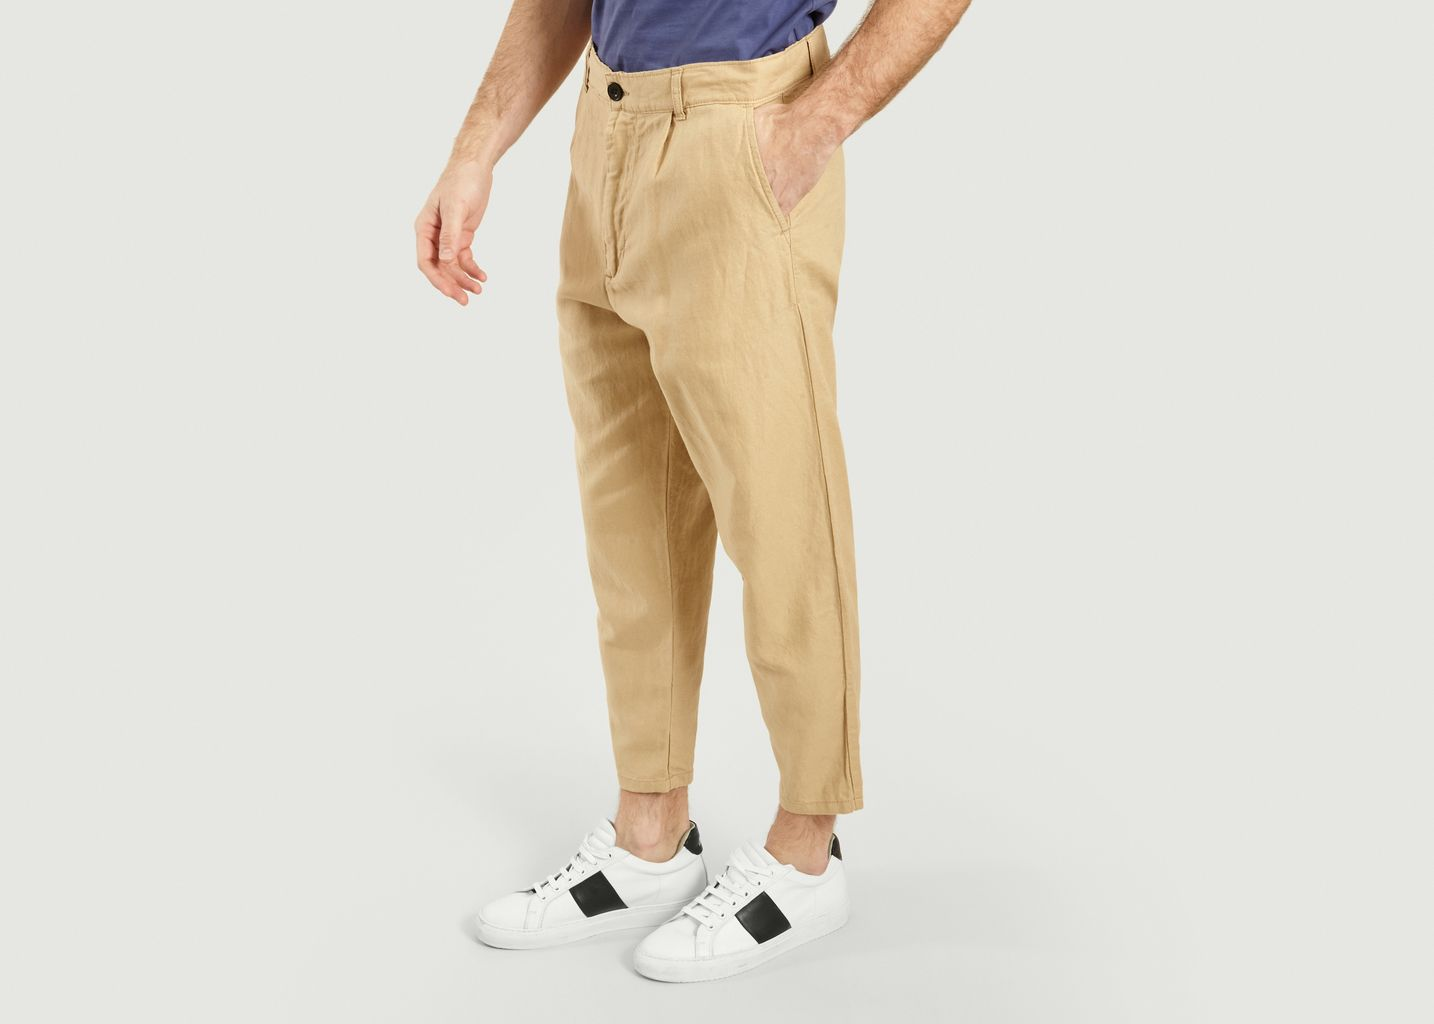 Pantalon Swing 20 - Olow